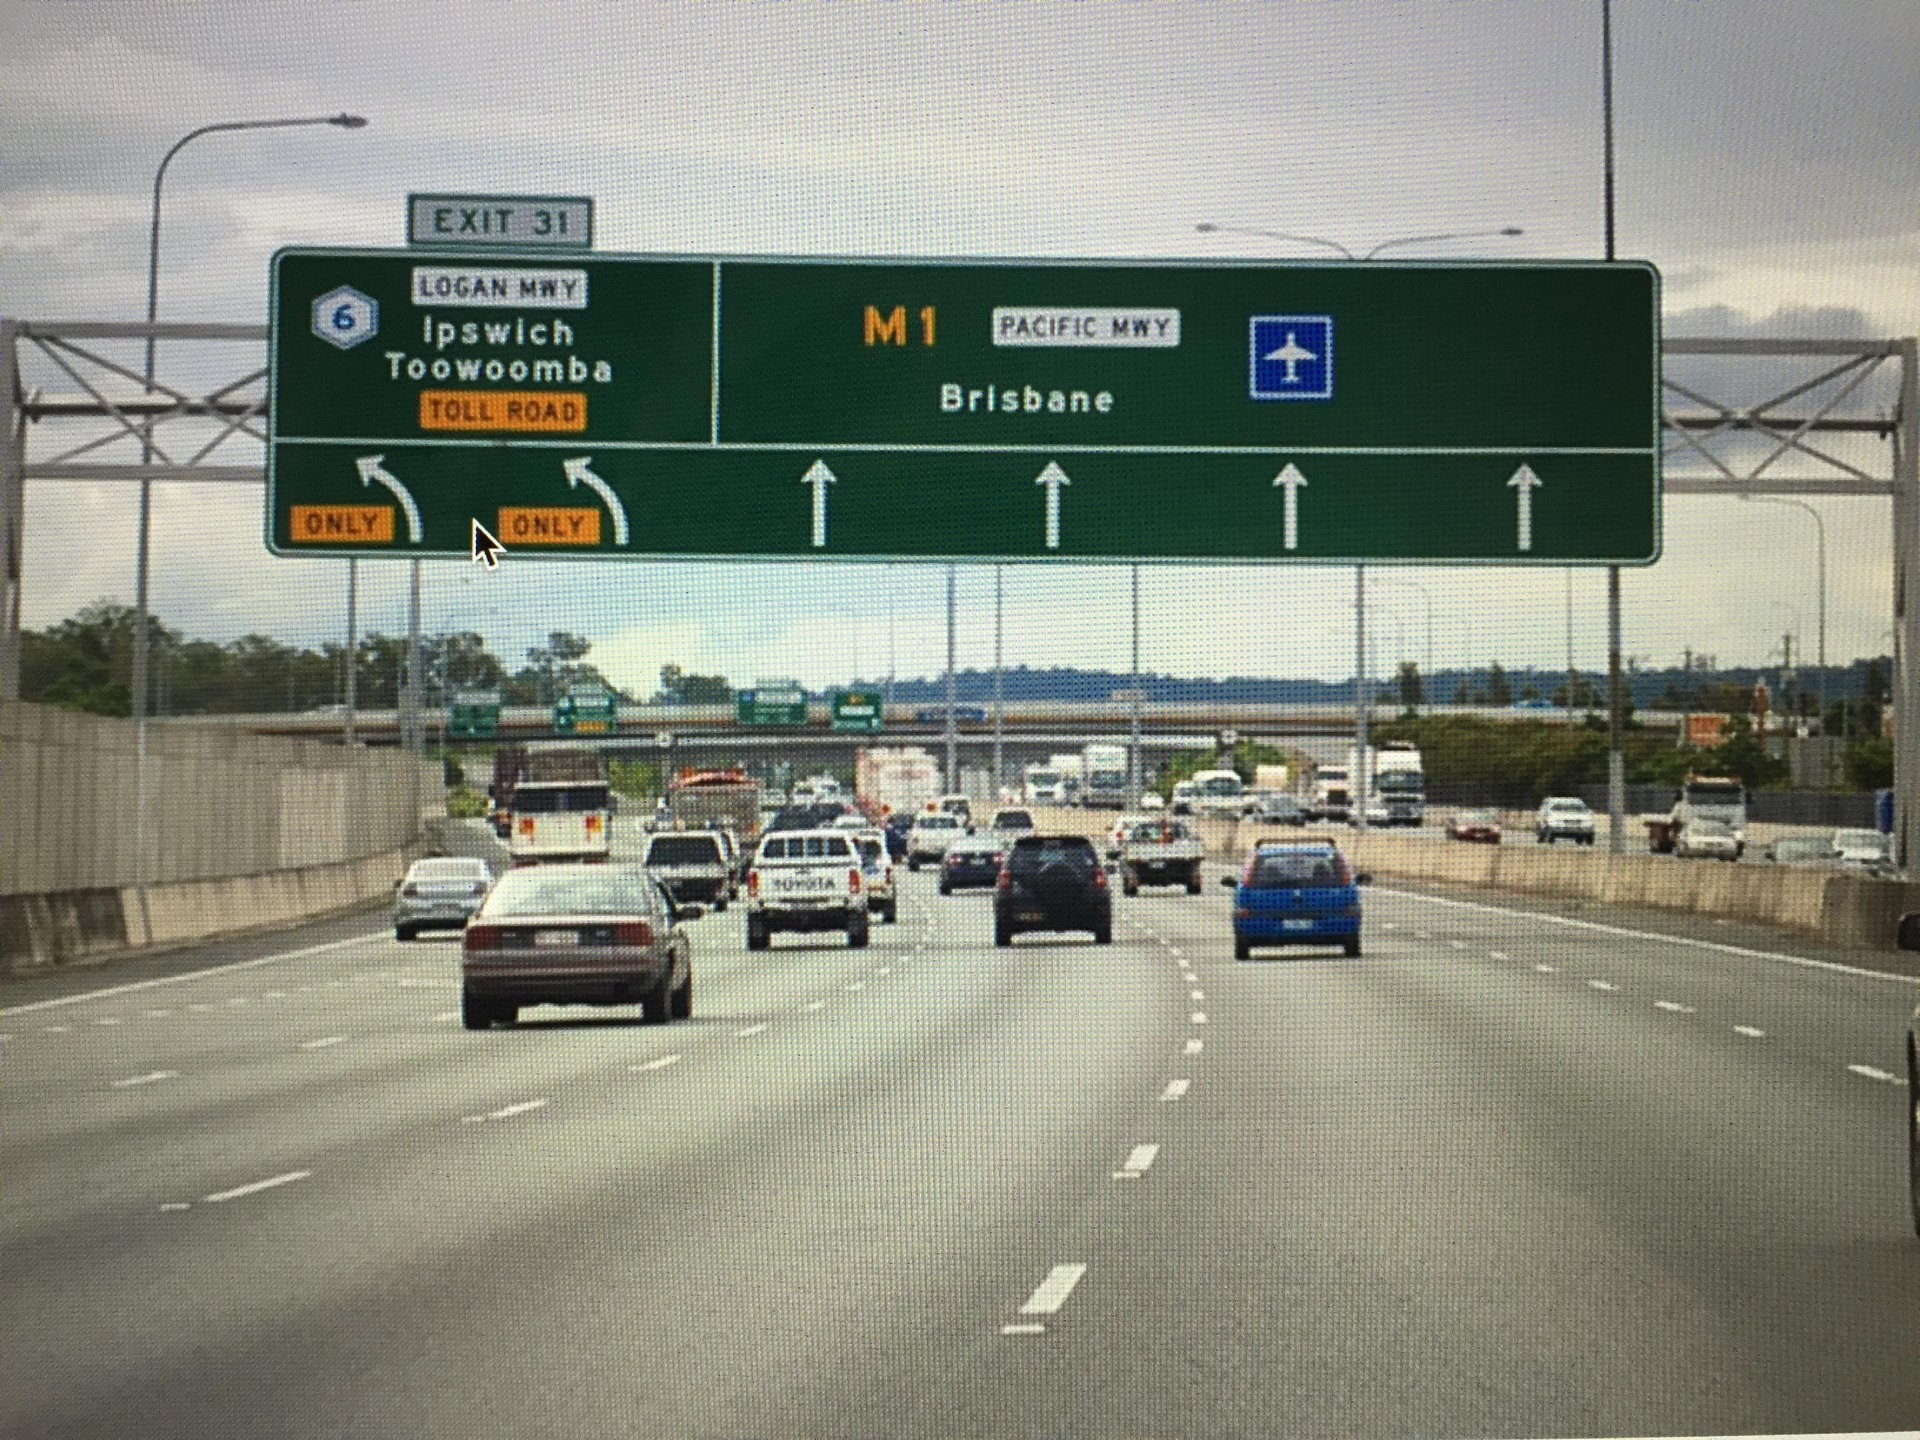 Road Sign Installation Business Net $400K